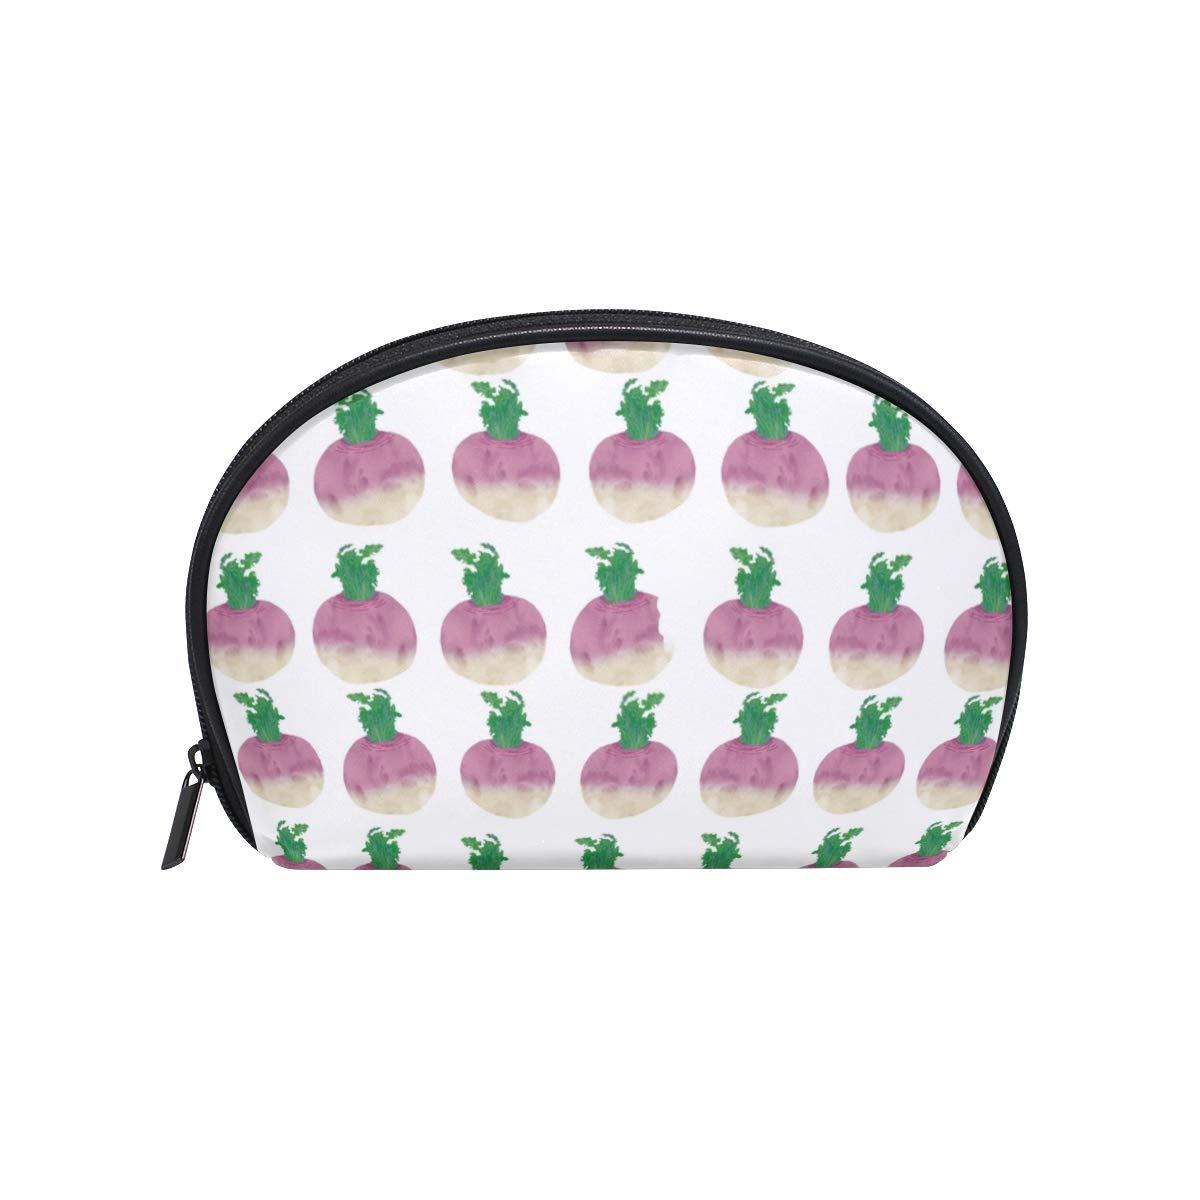 2cd608ea89f2 Amazon.com : Half Moon Cosmetic Beauty Bag Turnip Vegetable Travel ...